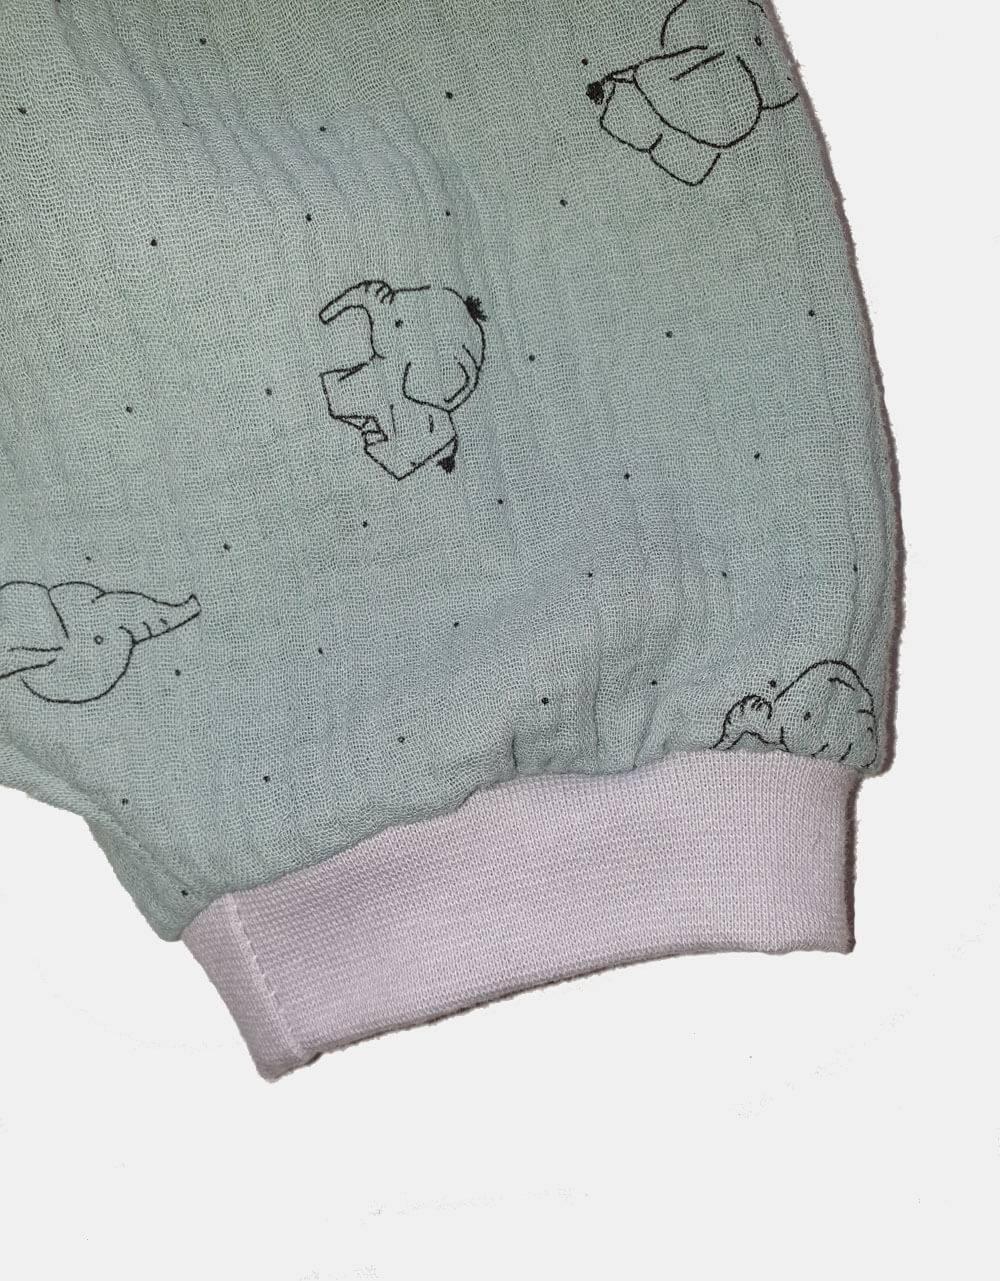 Kurze Hose aus Musselin pastellgrün mit Elefant